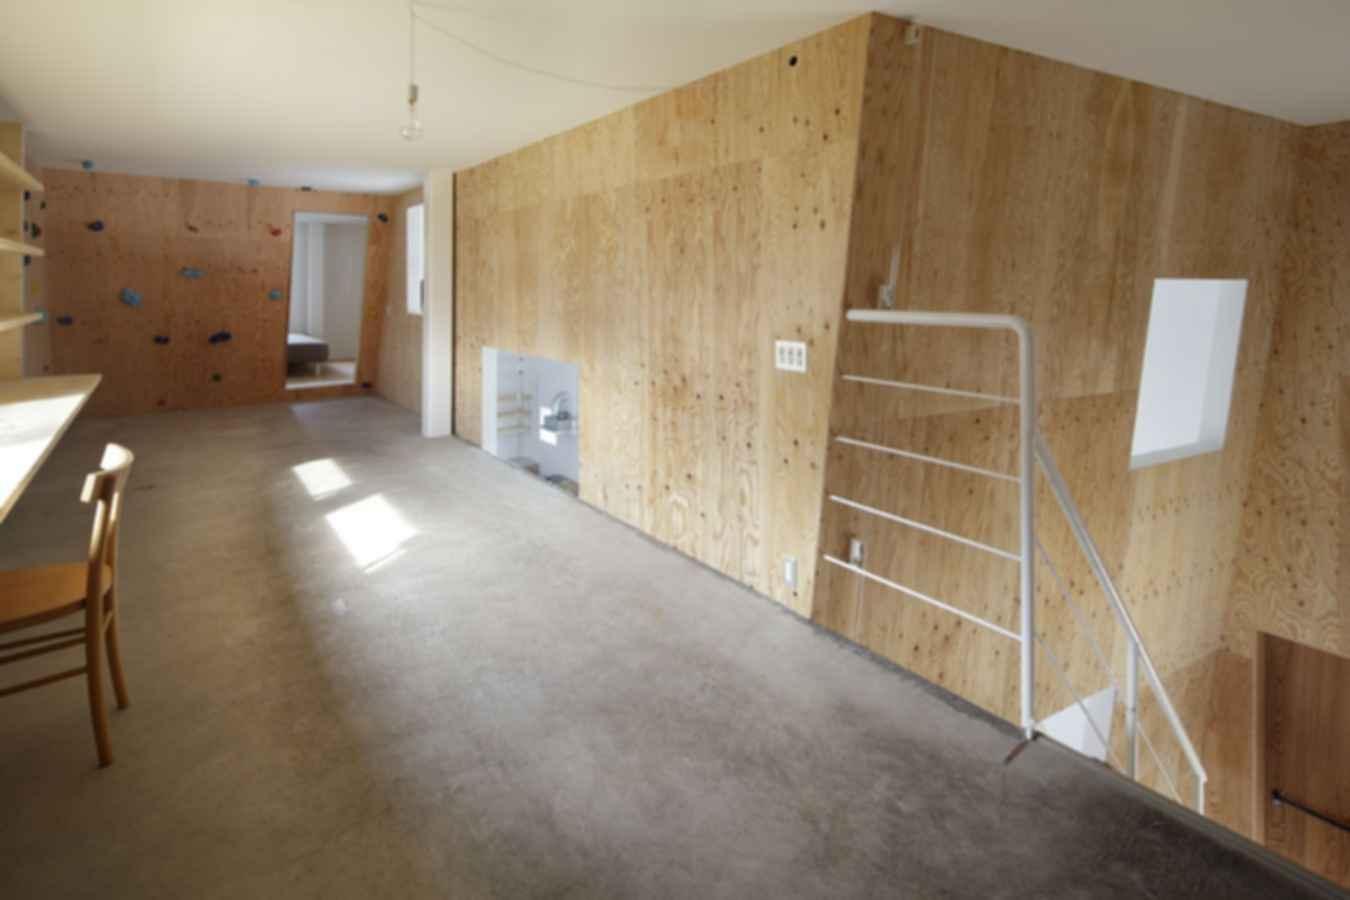 A Home for Climbers - Interior/Climbing Wall